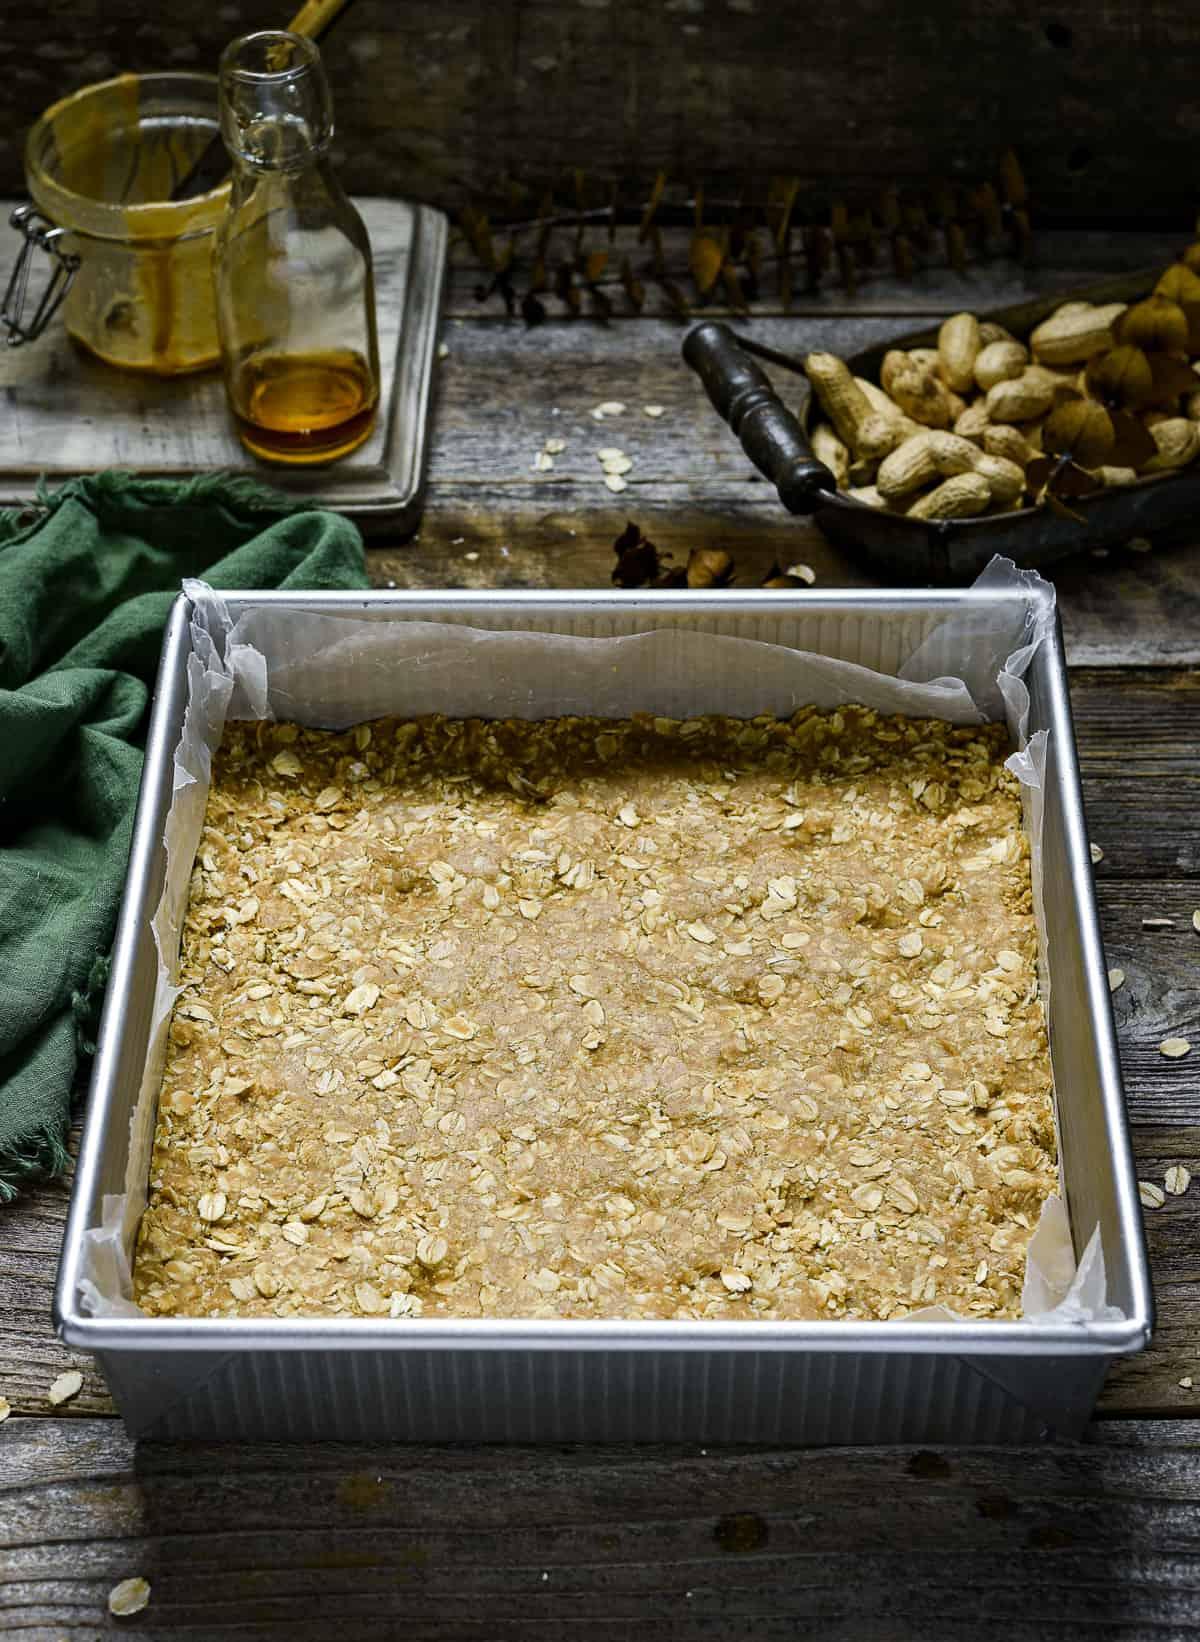 Peanut butter oatmeal mixture in baking pan.